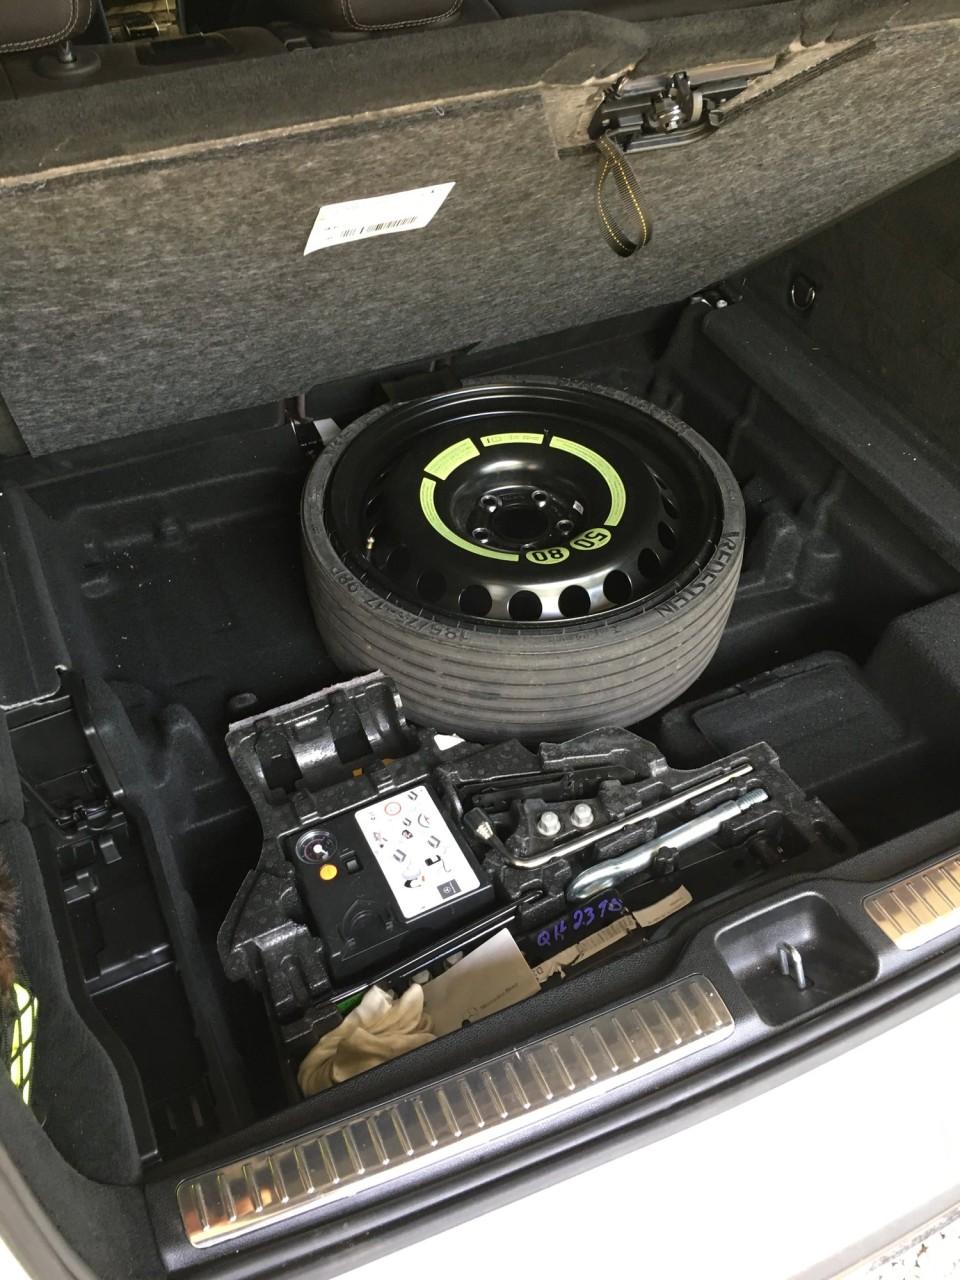 Roata / Roti Rezerva Slim 15 / 16 BMW seria 3 – originale - 5x120